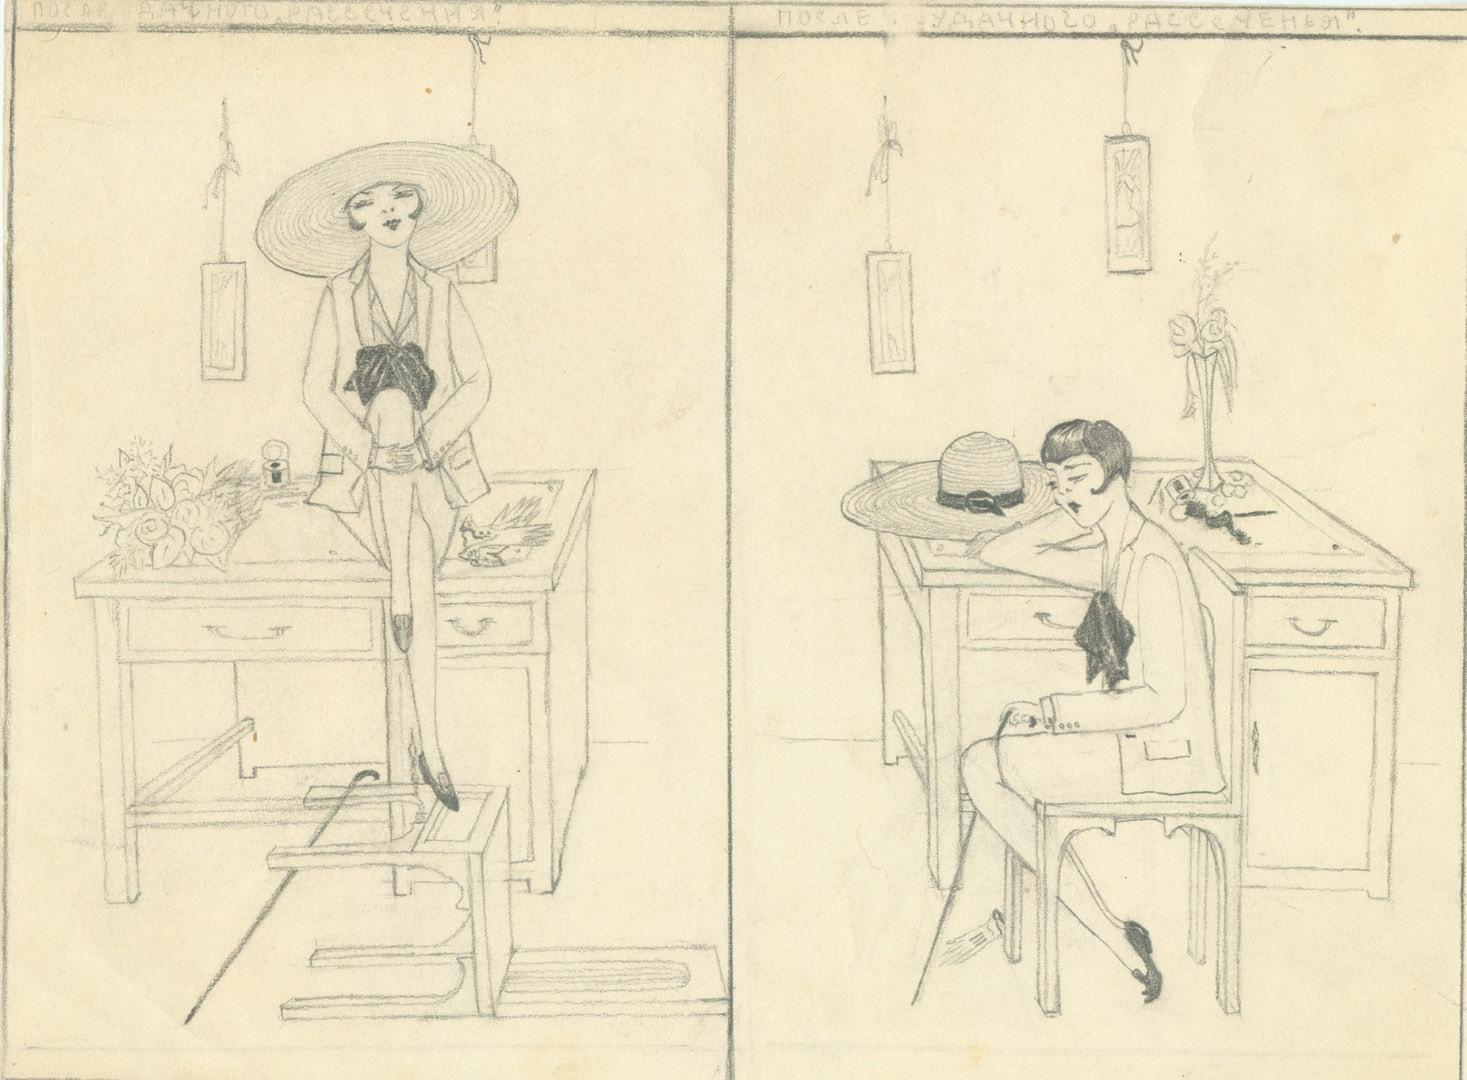 Drawing of Woman waiting, 2 frames